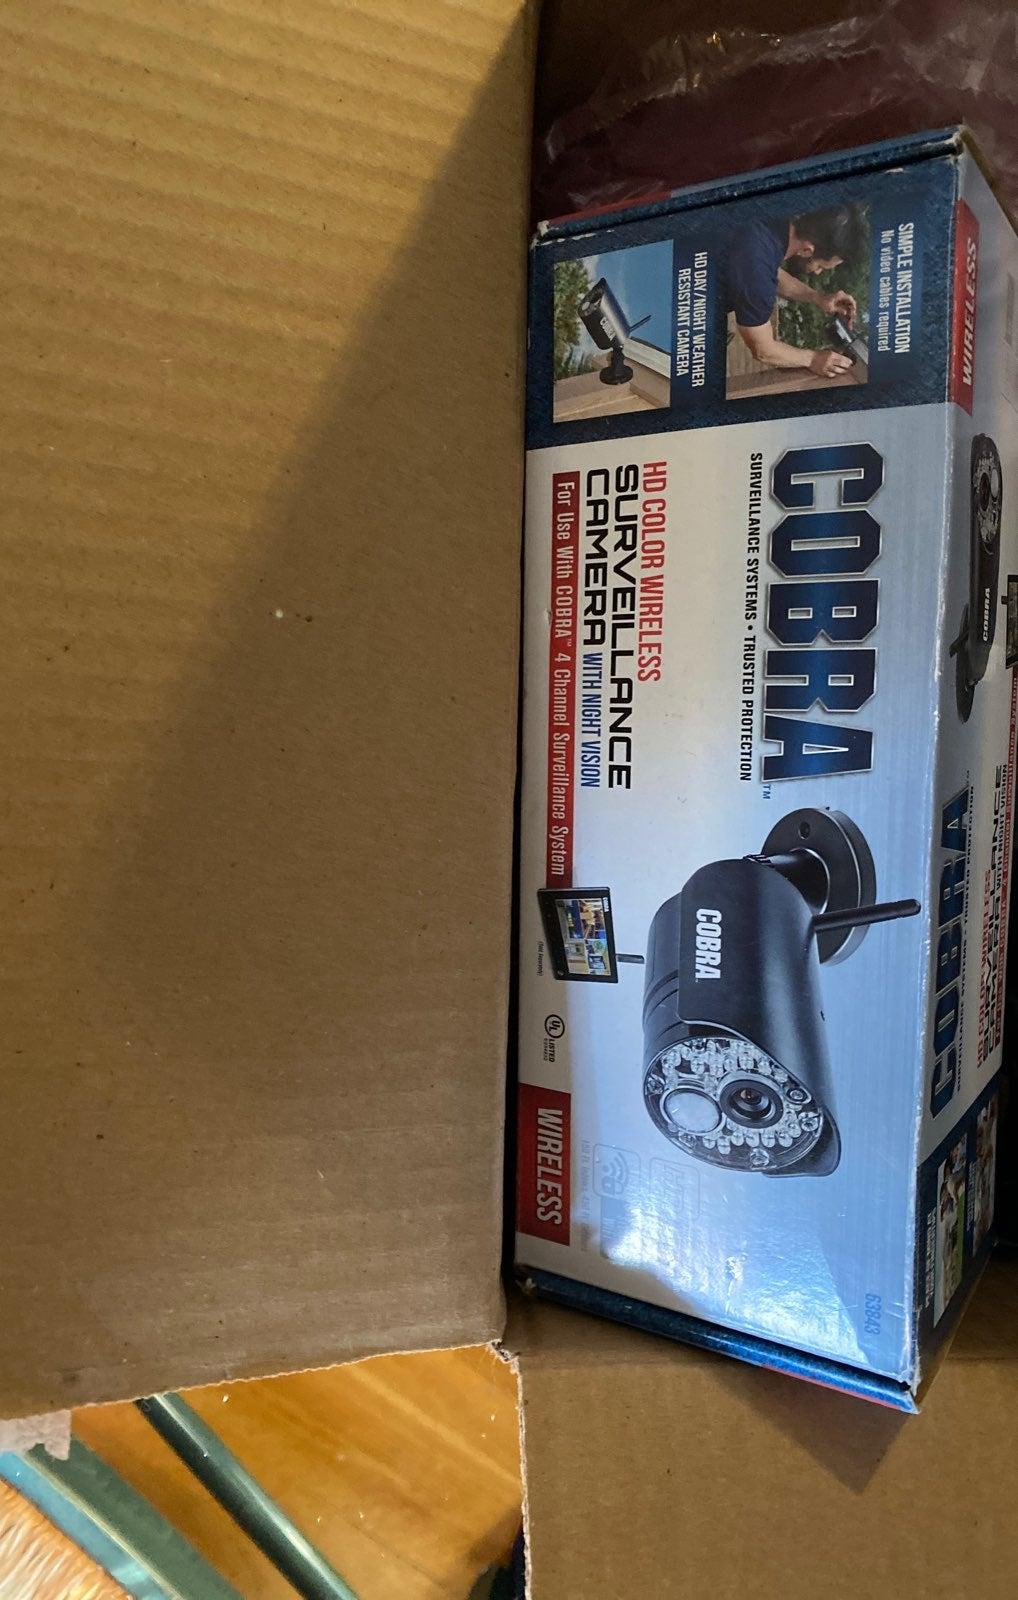 New 2 cobra add on security cameras